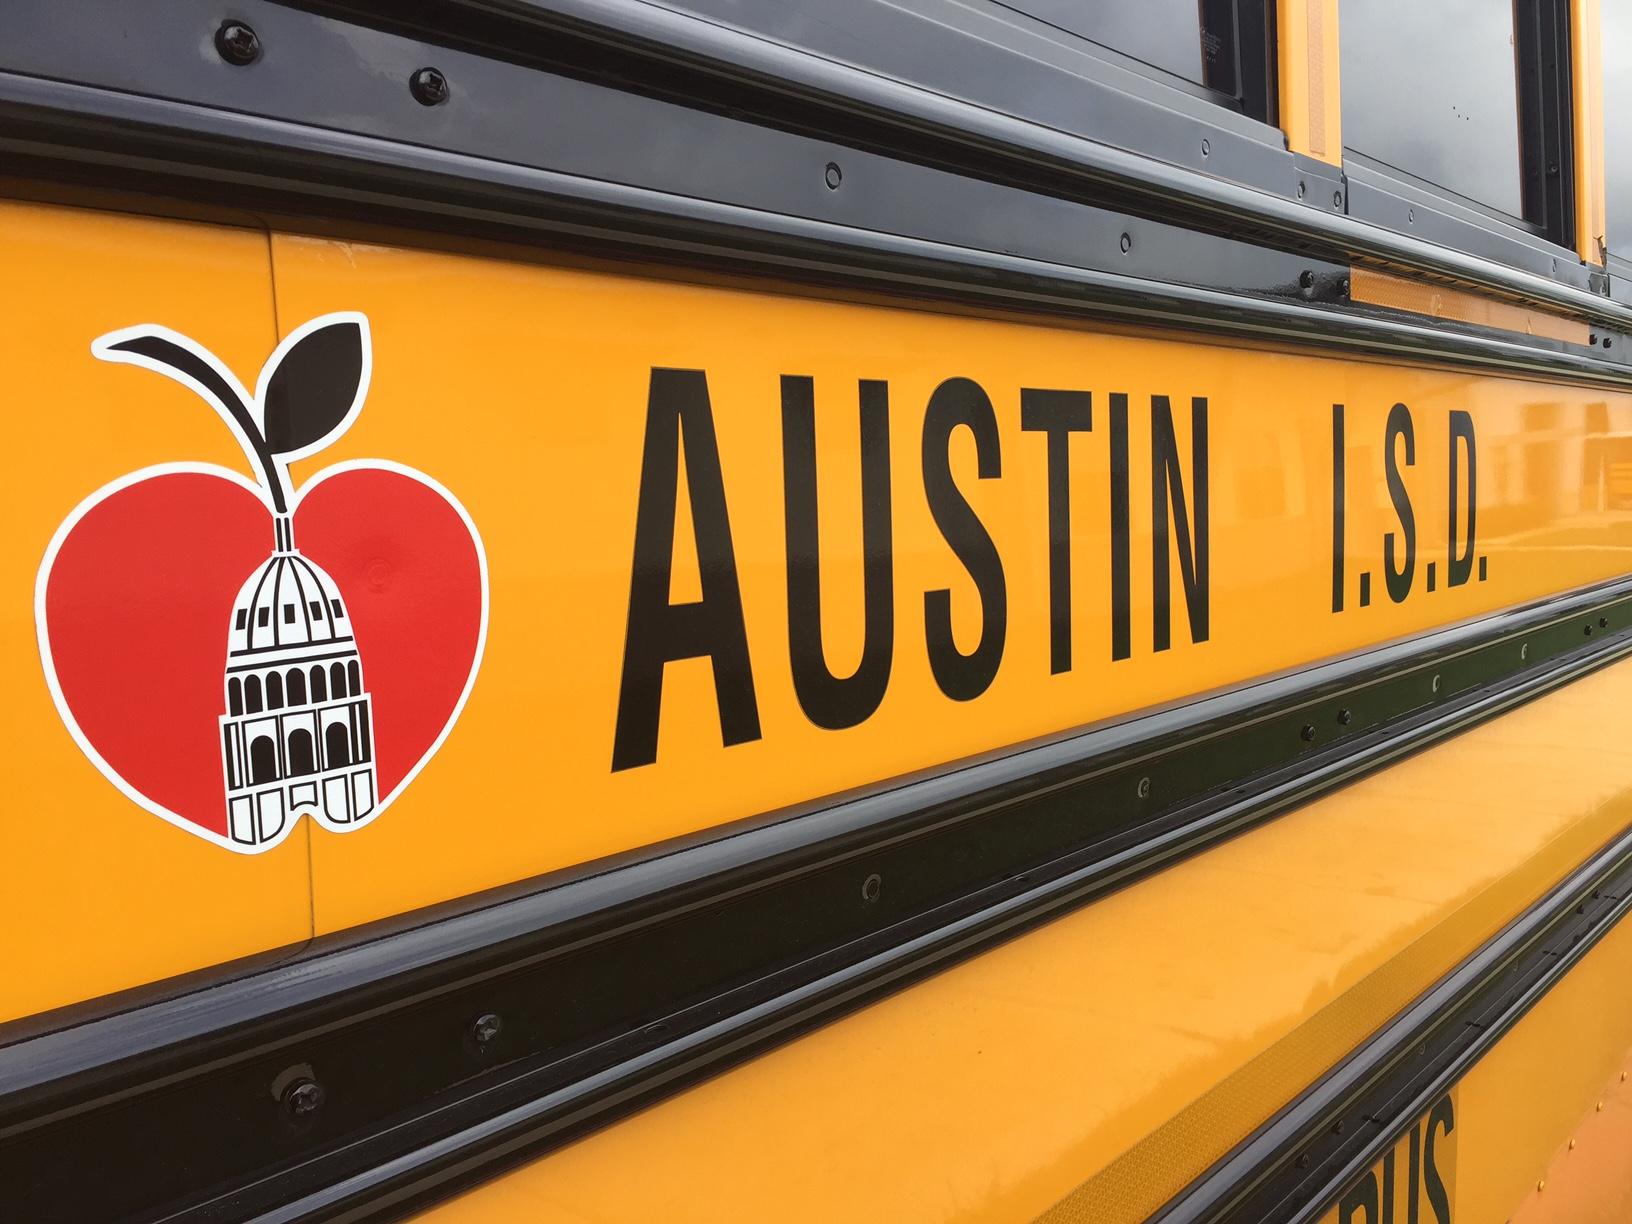 Austin ISD_335313